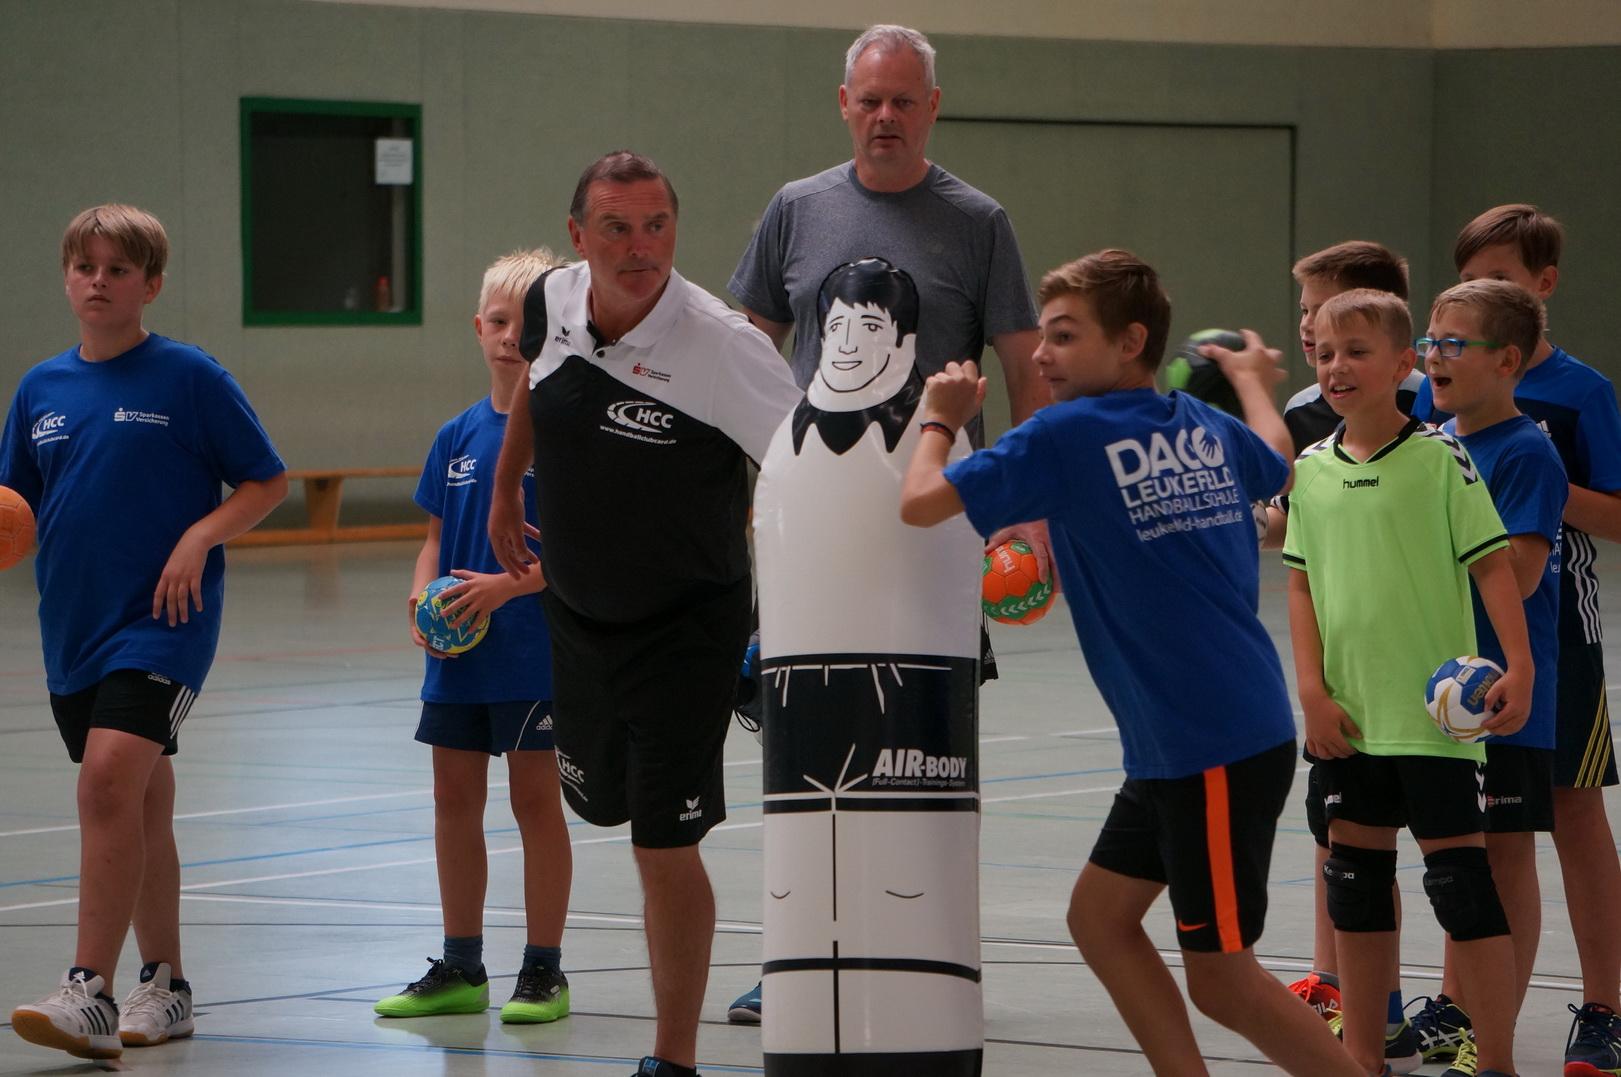 201808_Handballcamp_SDH_MG_227w